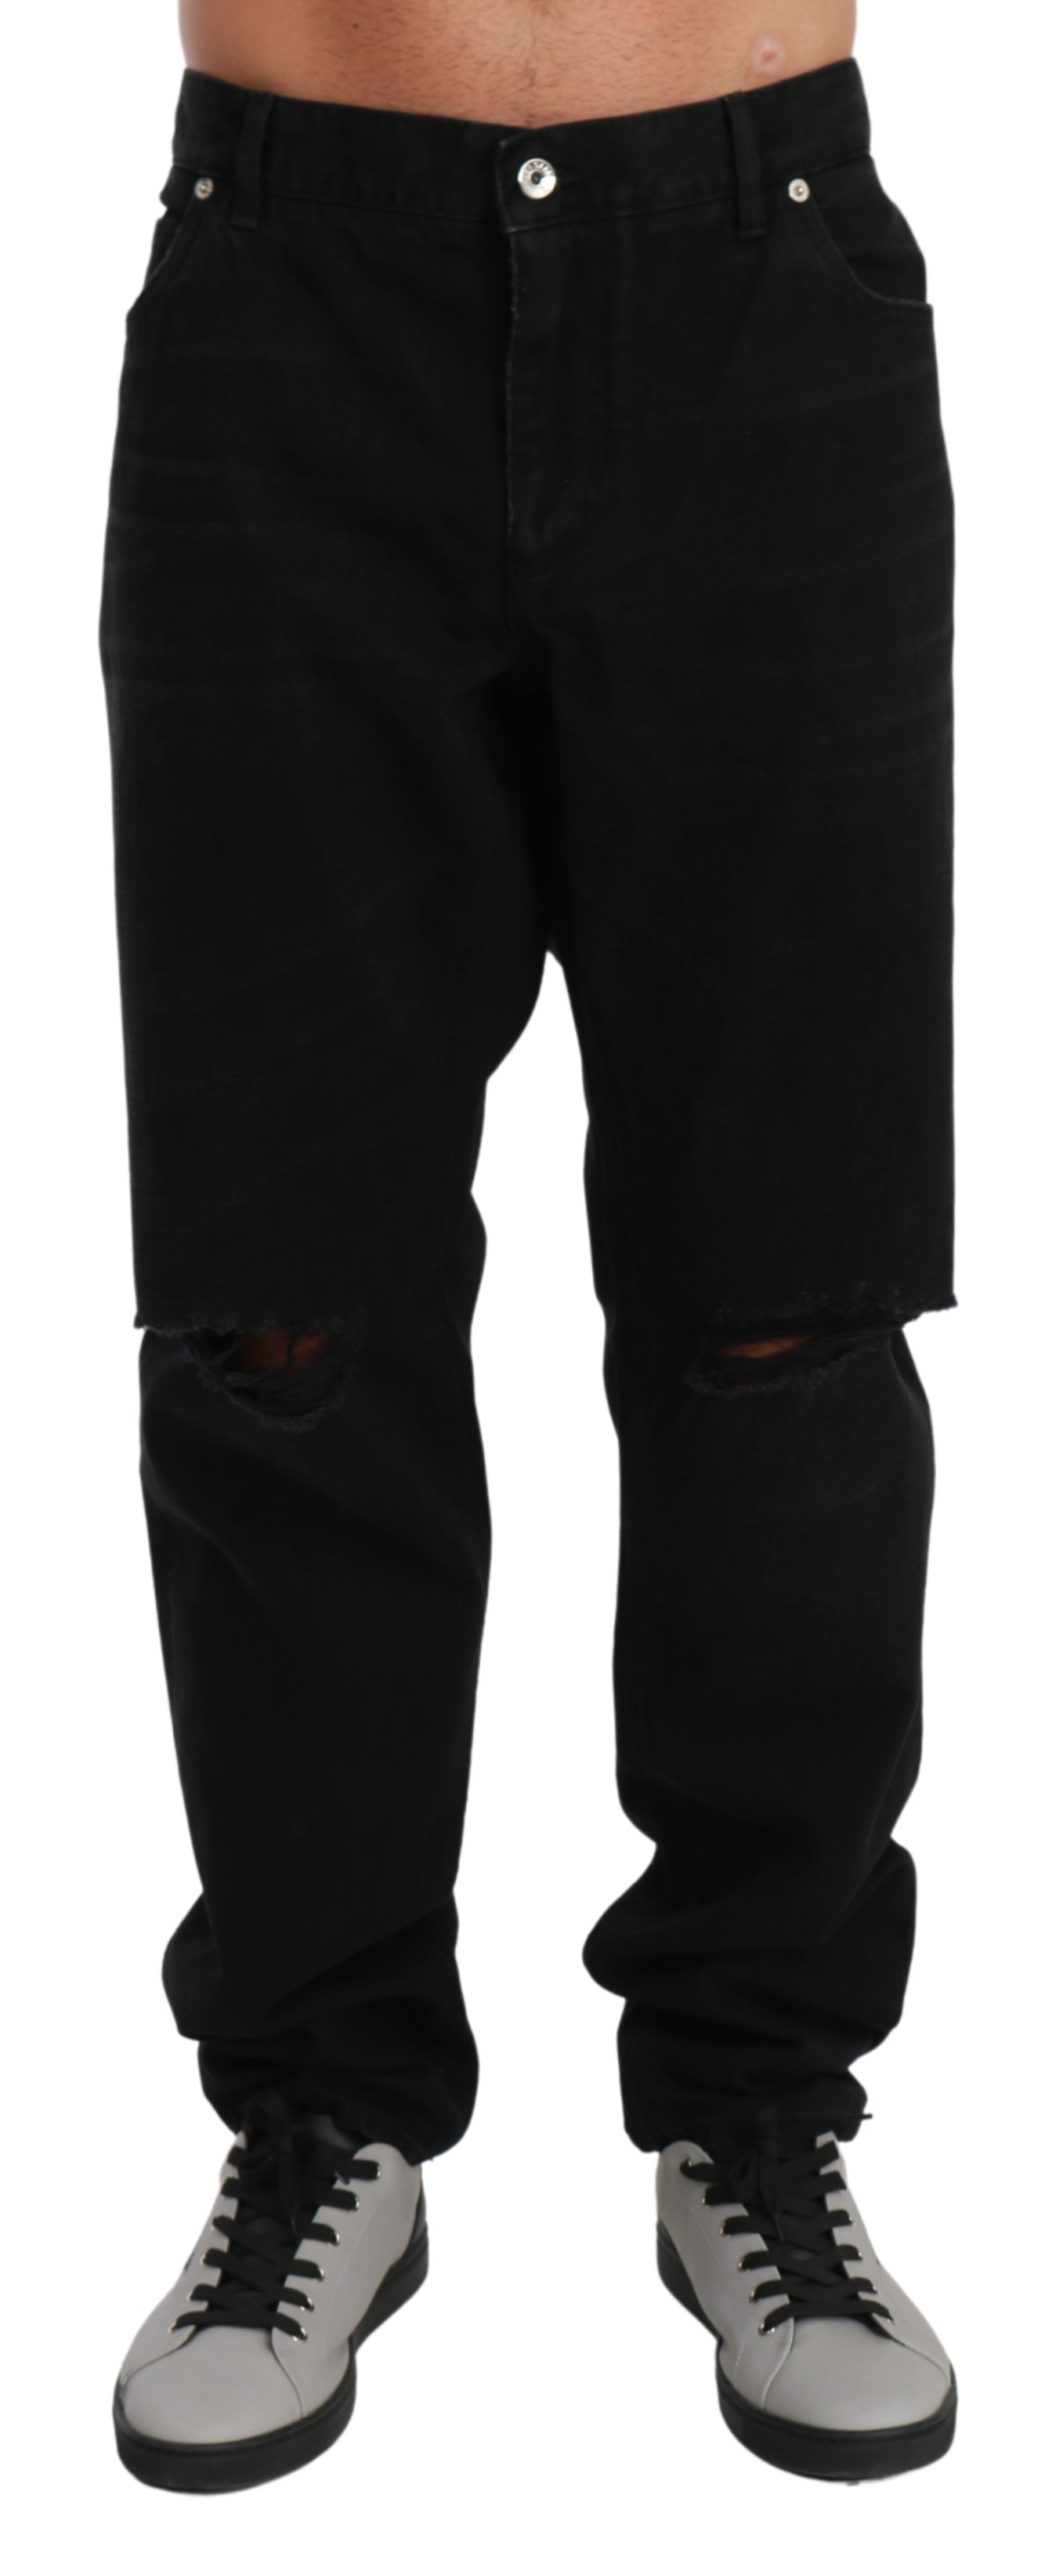 Dolce & Gabbana Men's Ripped Skinny Denim MARTINI Jeans Black PAN71008 - IT60 | 3XL